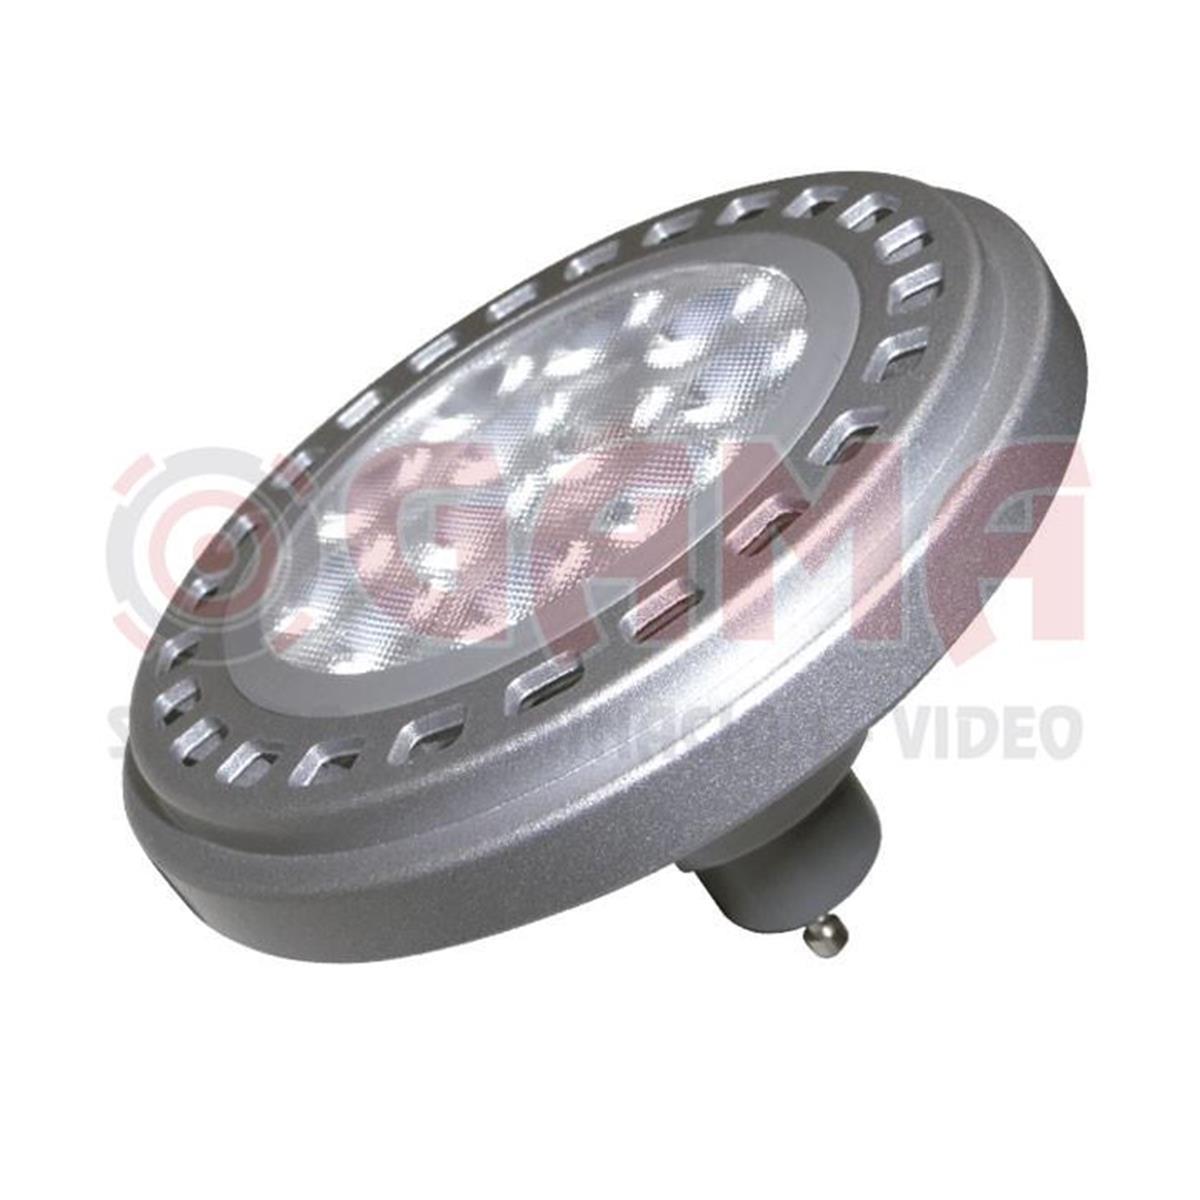 DIMERIZ1200 220V LAMPARA 14004958 AR111 TBCIN 38° HALOSPOT 22015WD 15WBLANCO AR111 LED DIA L LUZ reBdxWCo